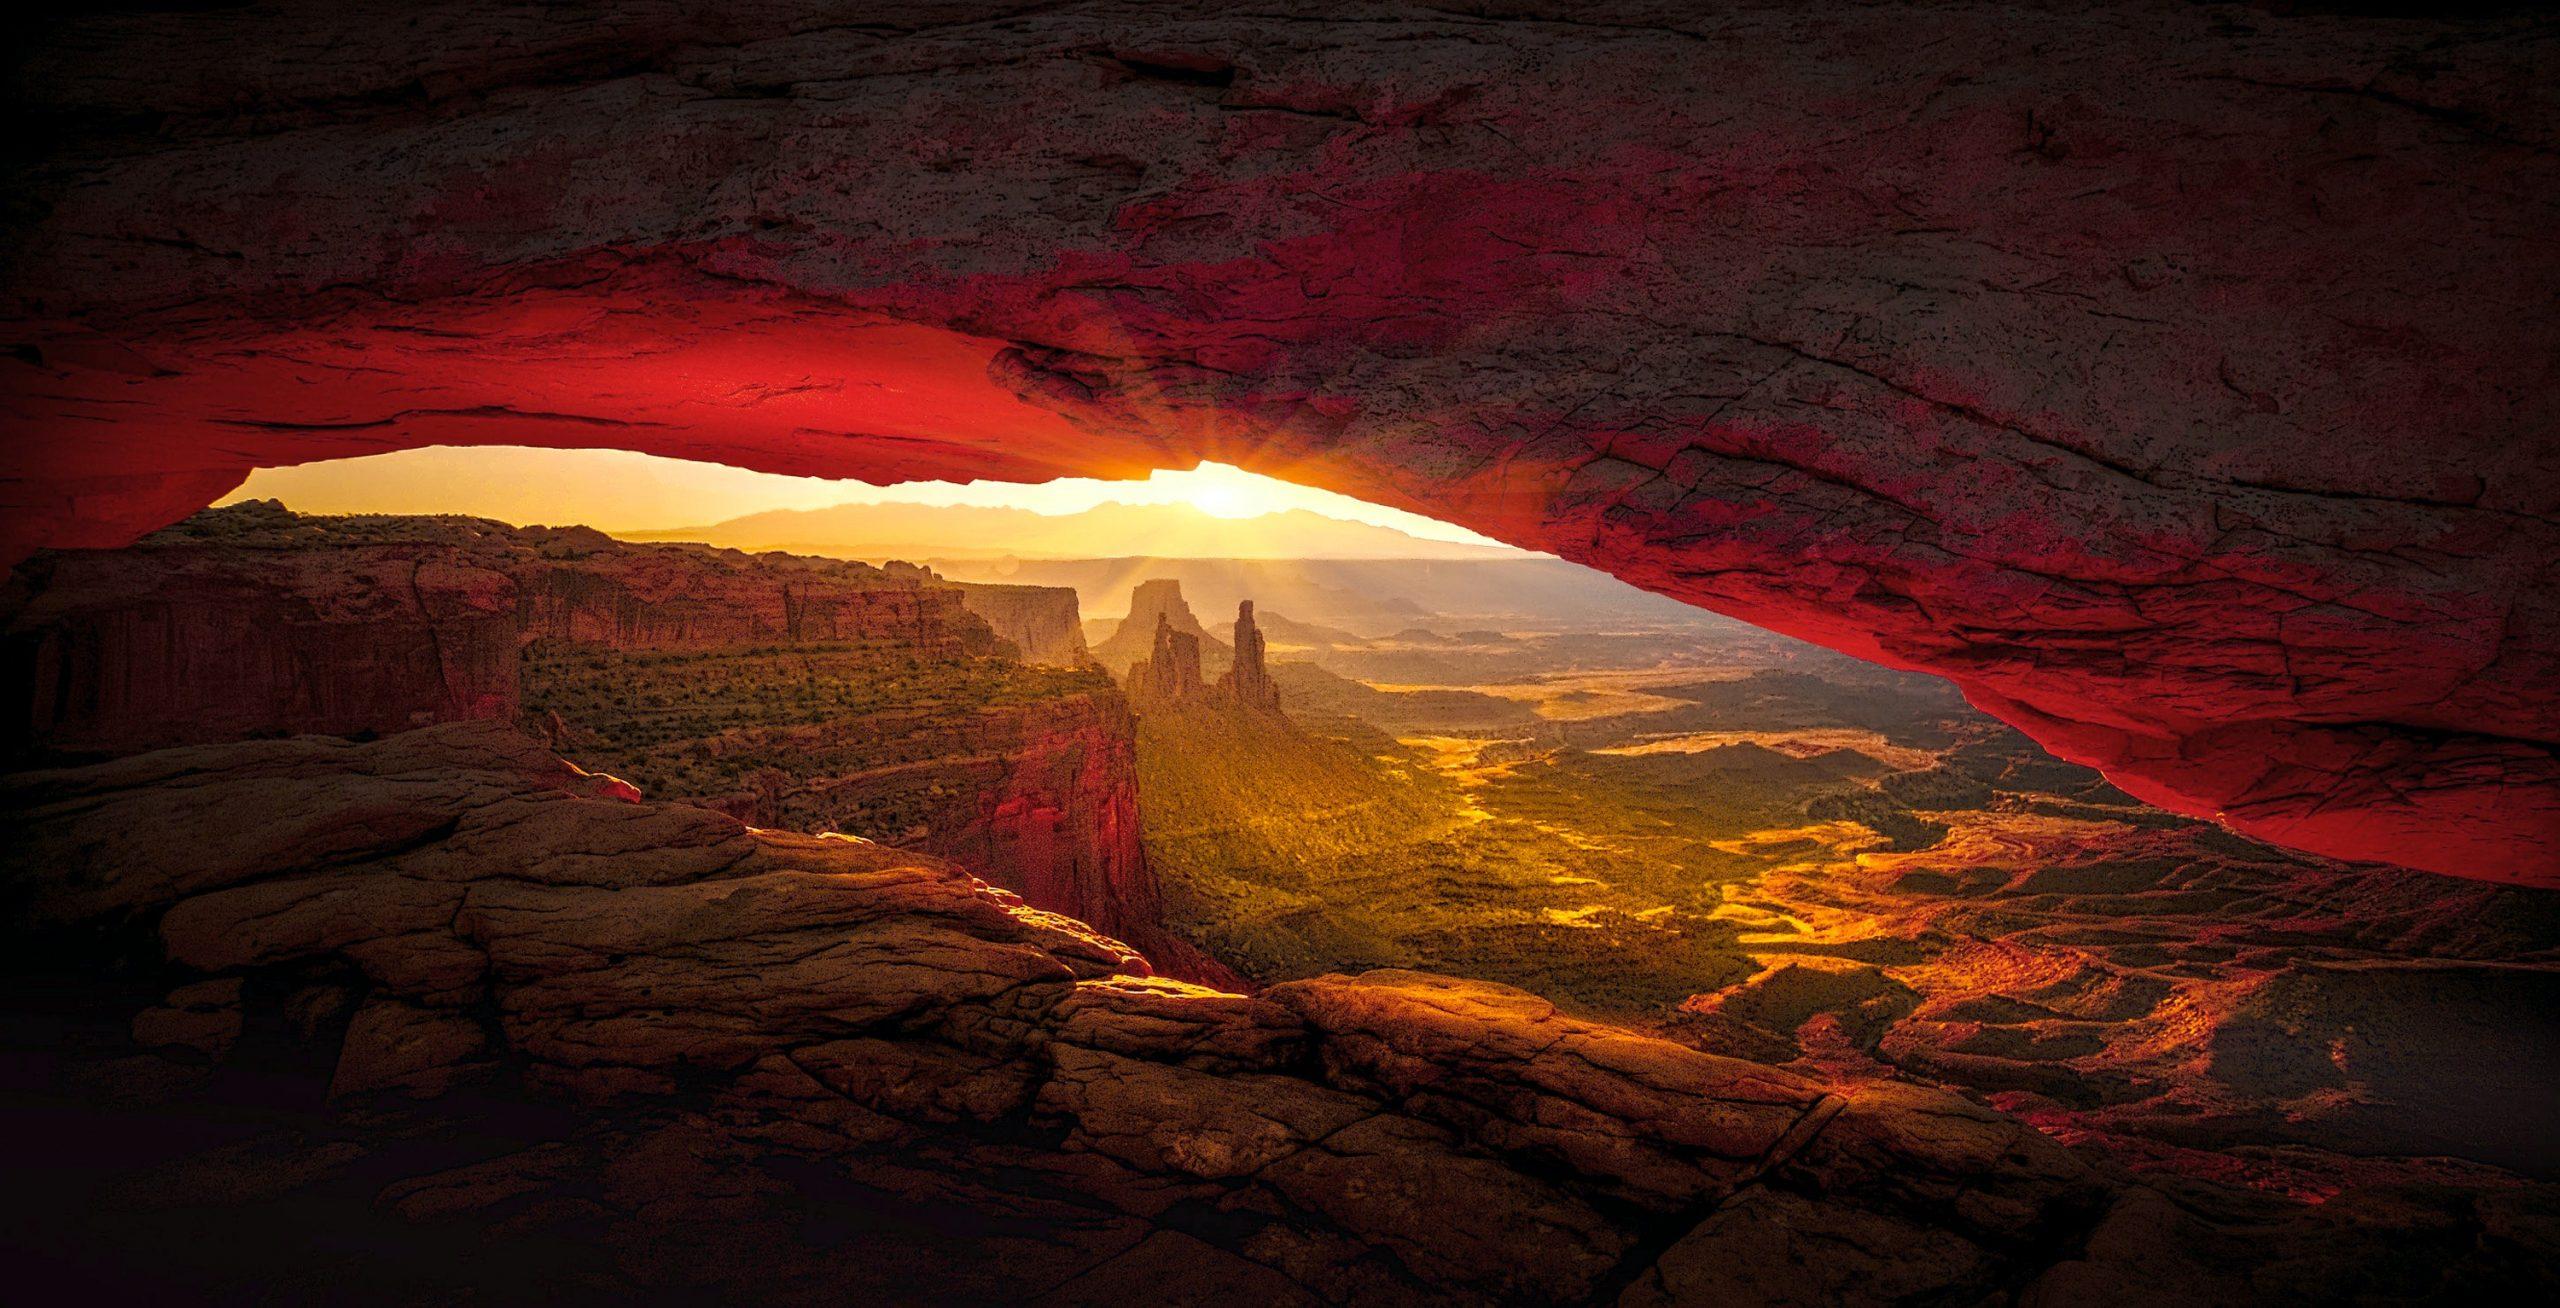 An eye shape image peeking into the Arizona mountains.